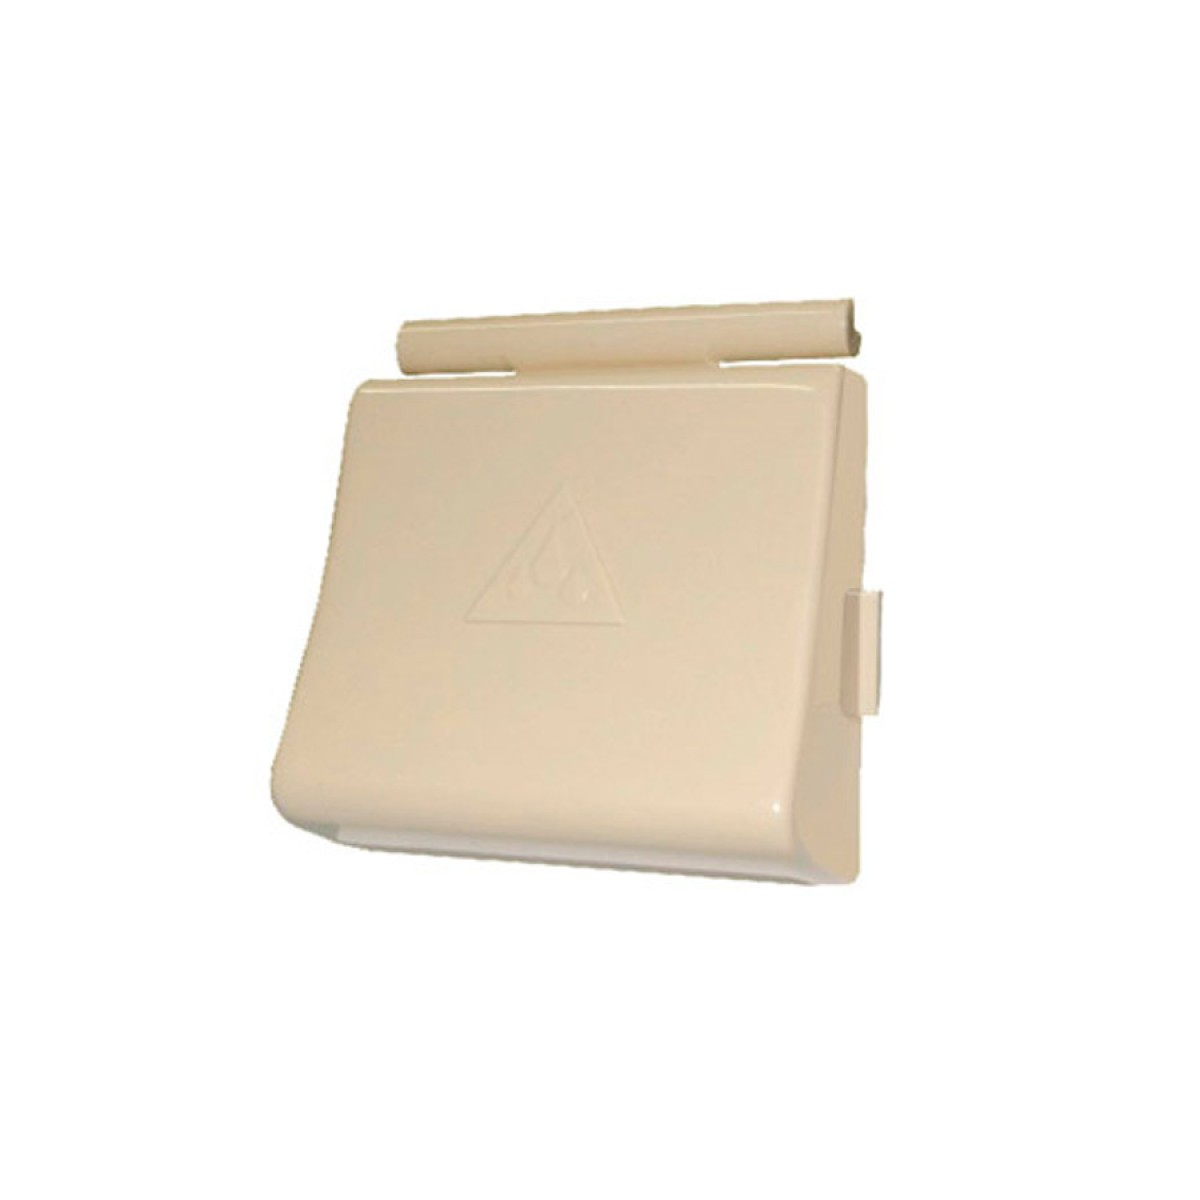 TECLA PLASTICA BEGE RI BASE 1.1/2´ DOCOL